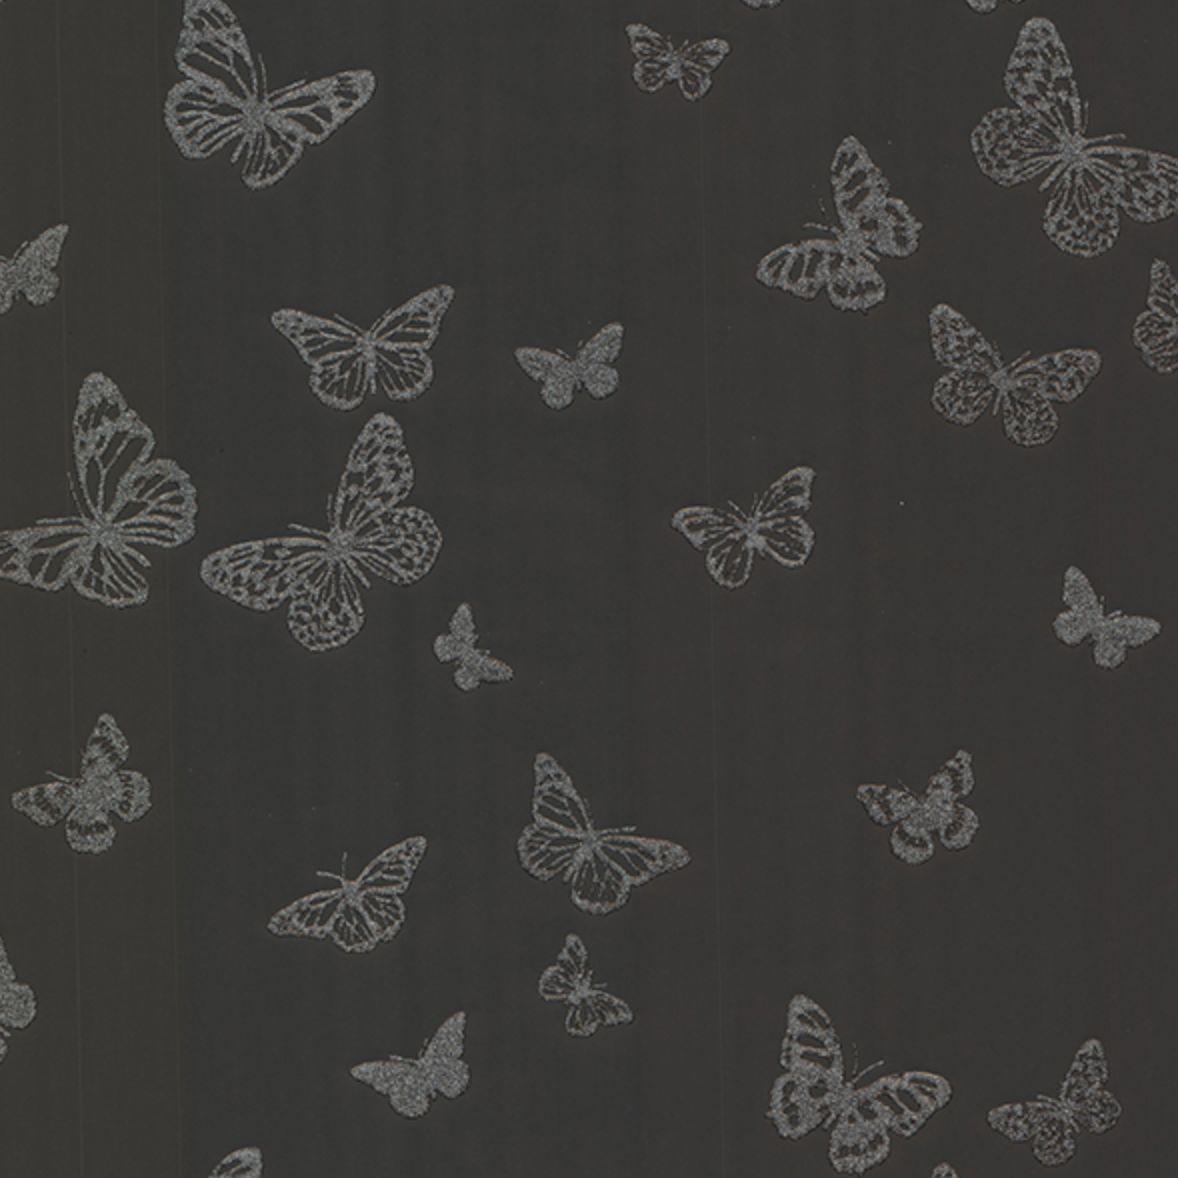 Brewster Pearl Black Butterfly Wallpaper